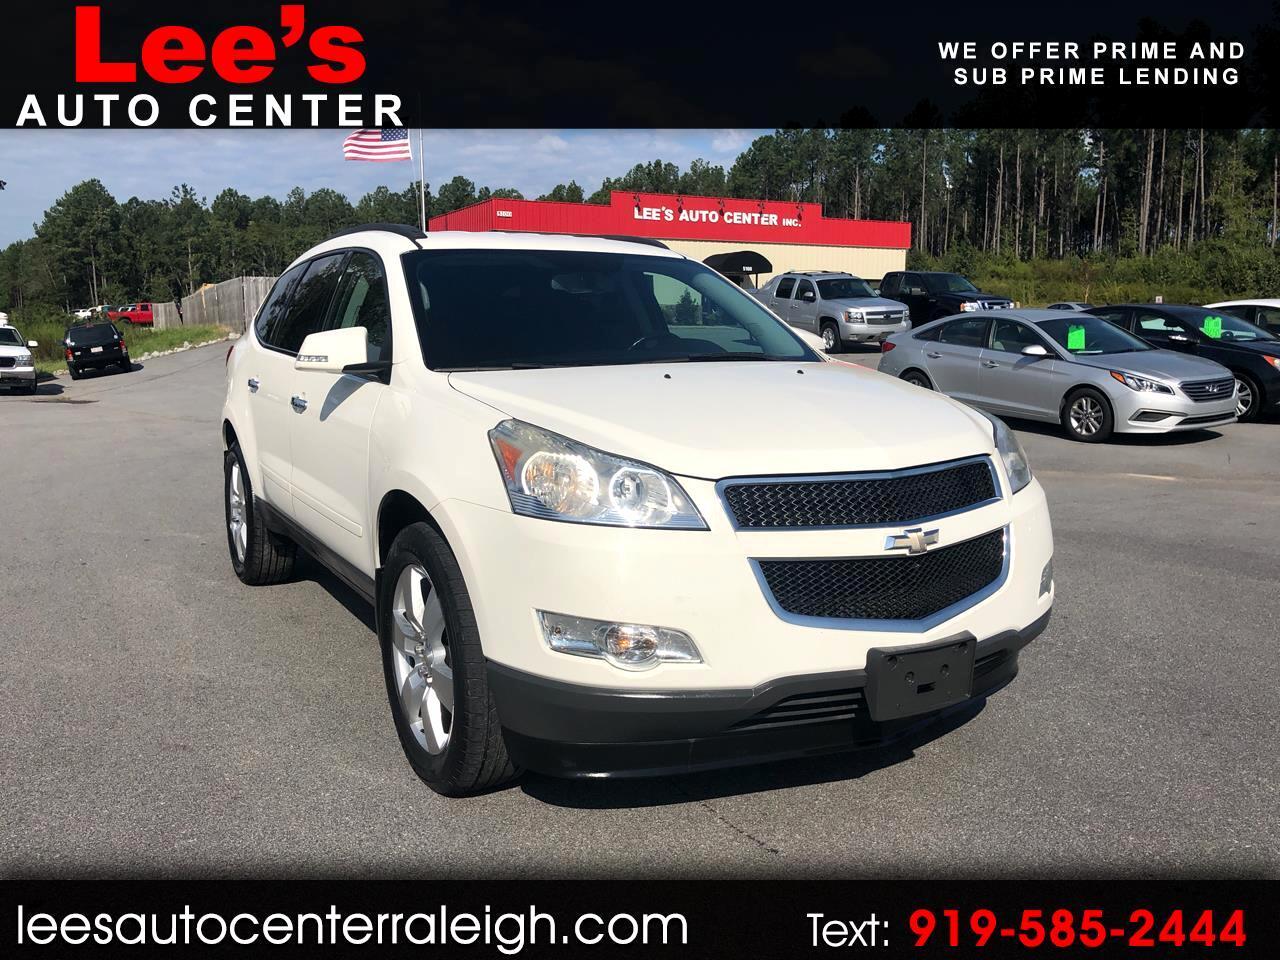 2012 Chevrolet Traverse FWD 4dr LT w/1LT